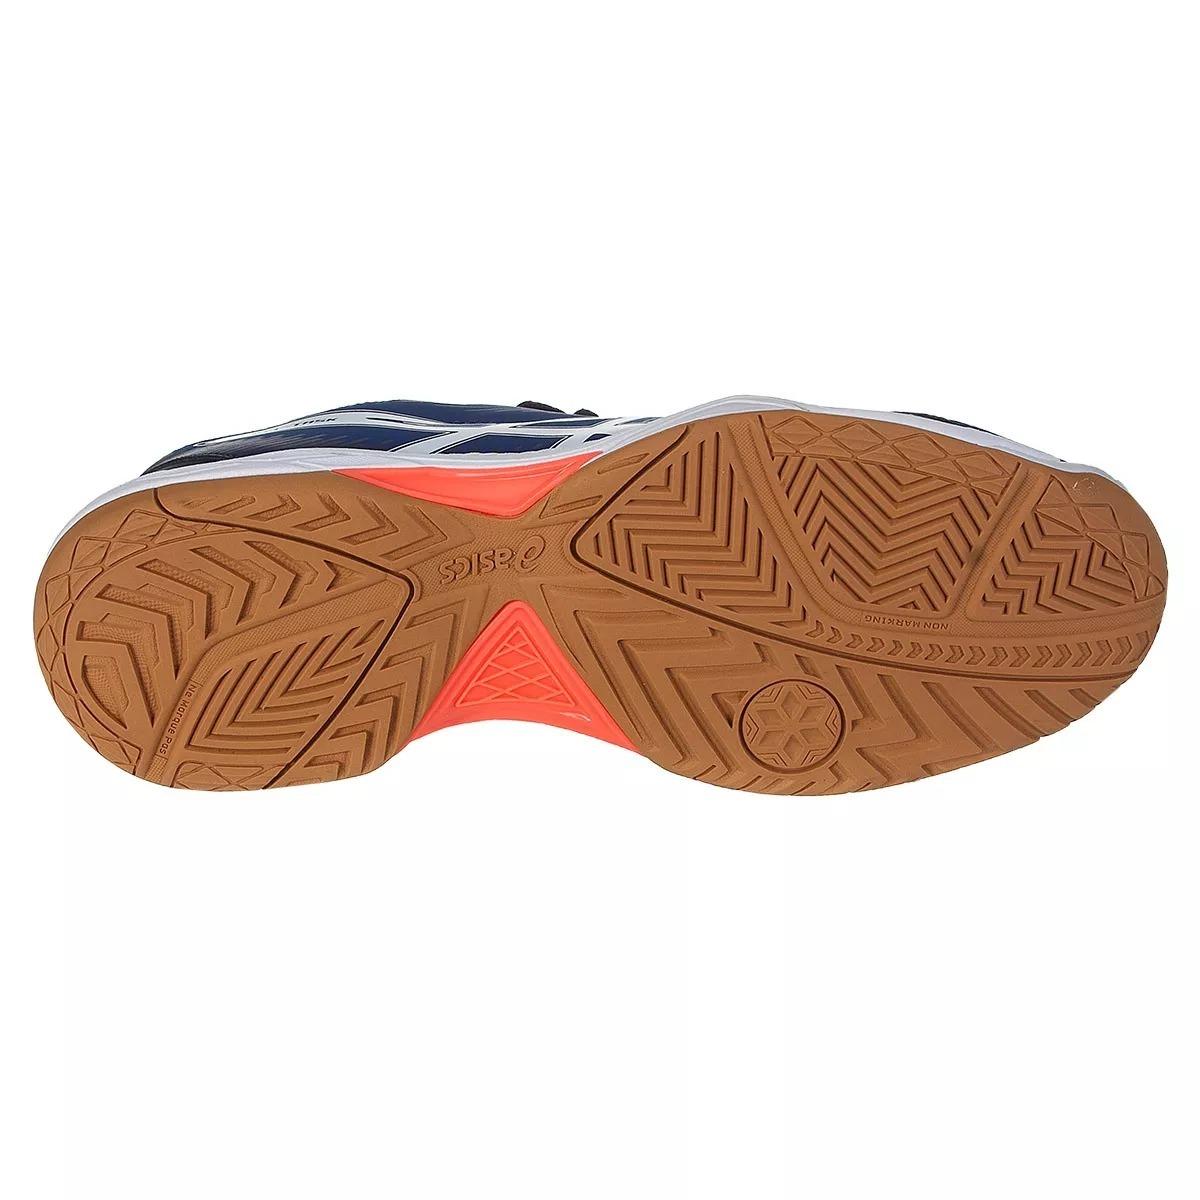 Carregando zoom... tênis asics gel task masculino vôlei indoor original  1magnus 02069616e8be1